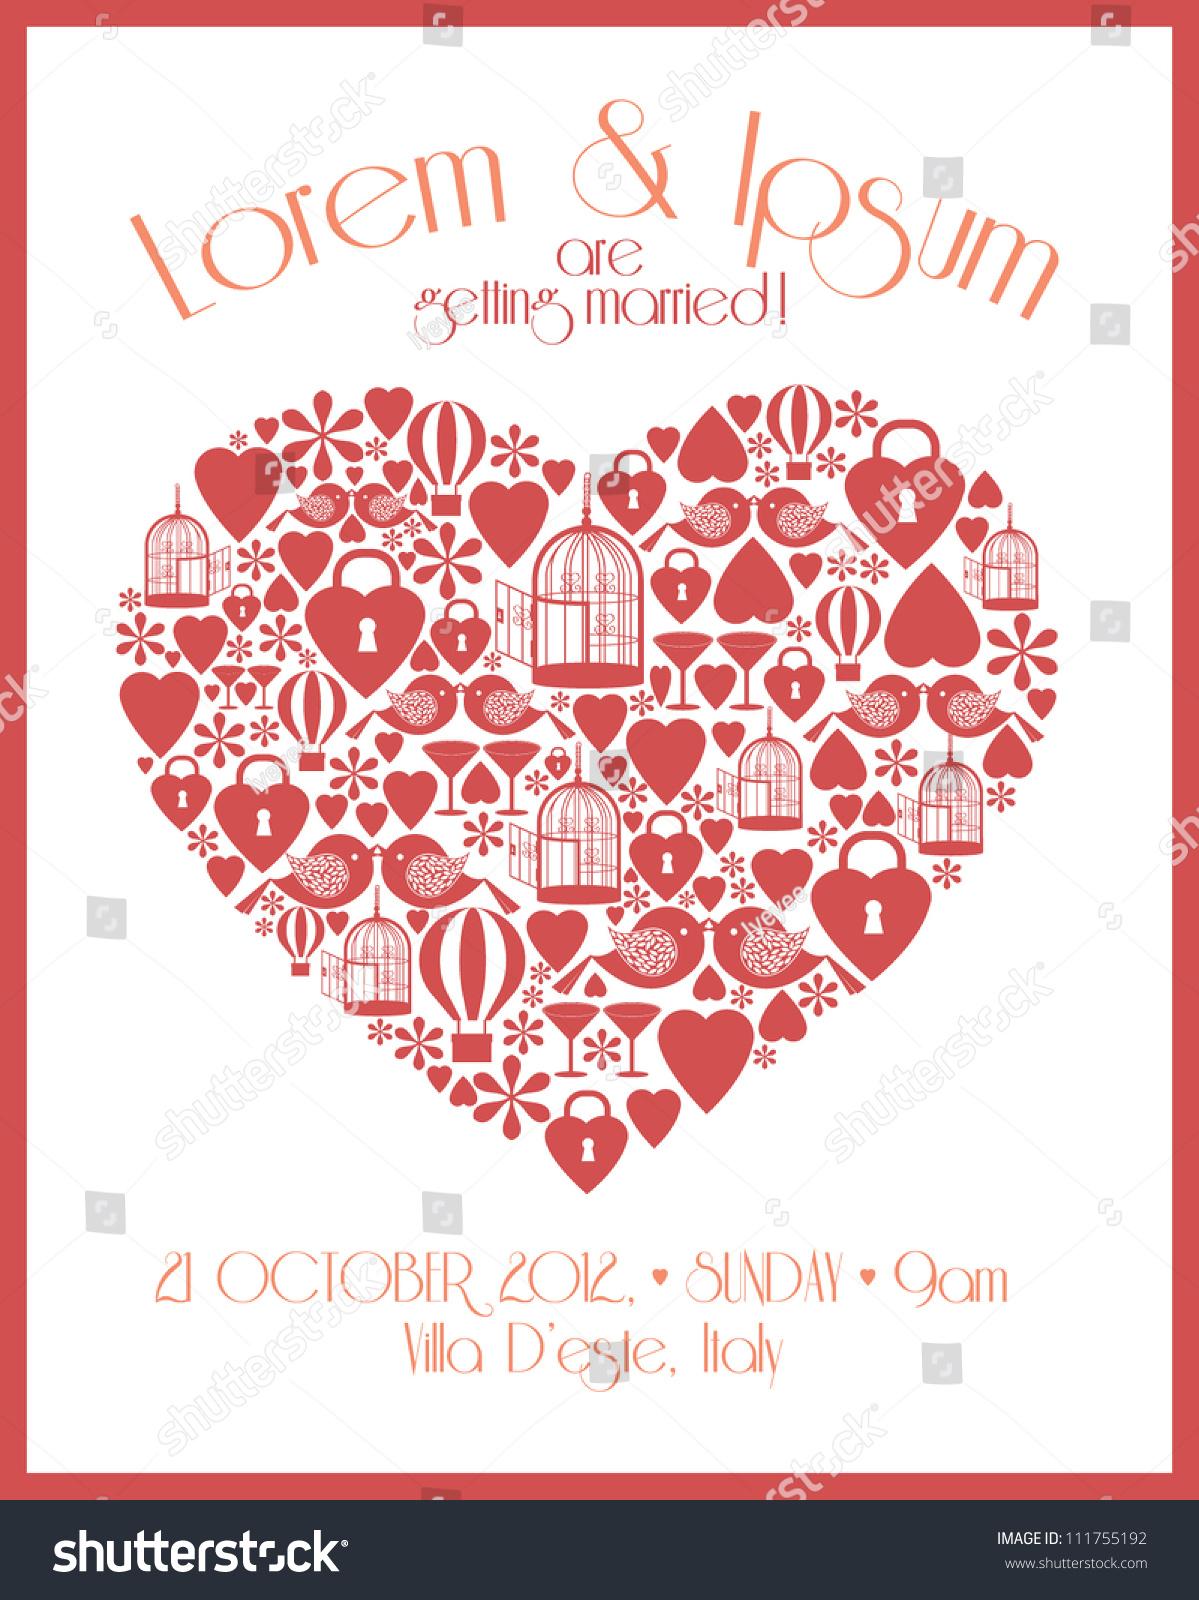 Heart Wedding Invitation Template Stock Vector (Royalty Free ...